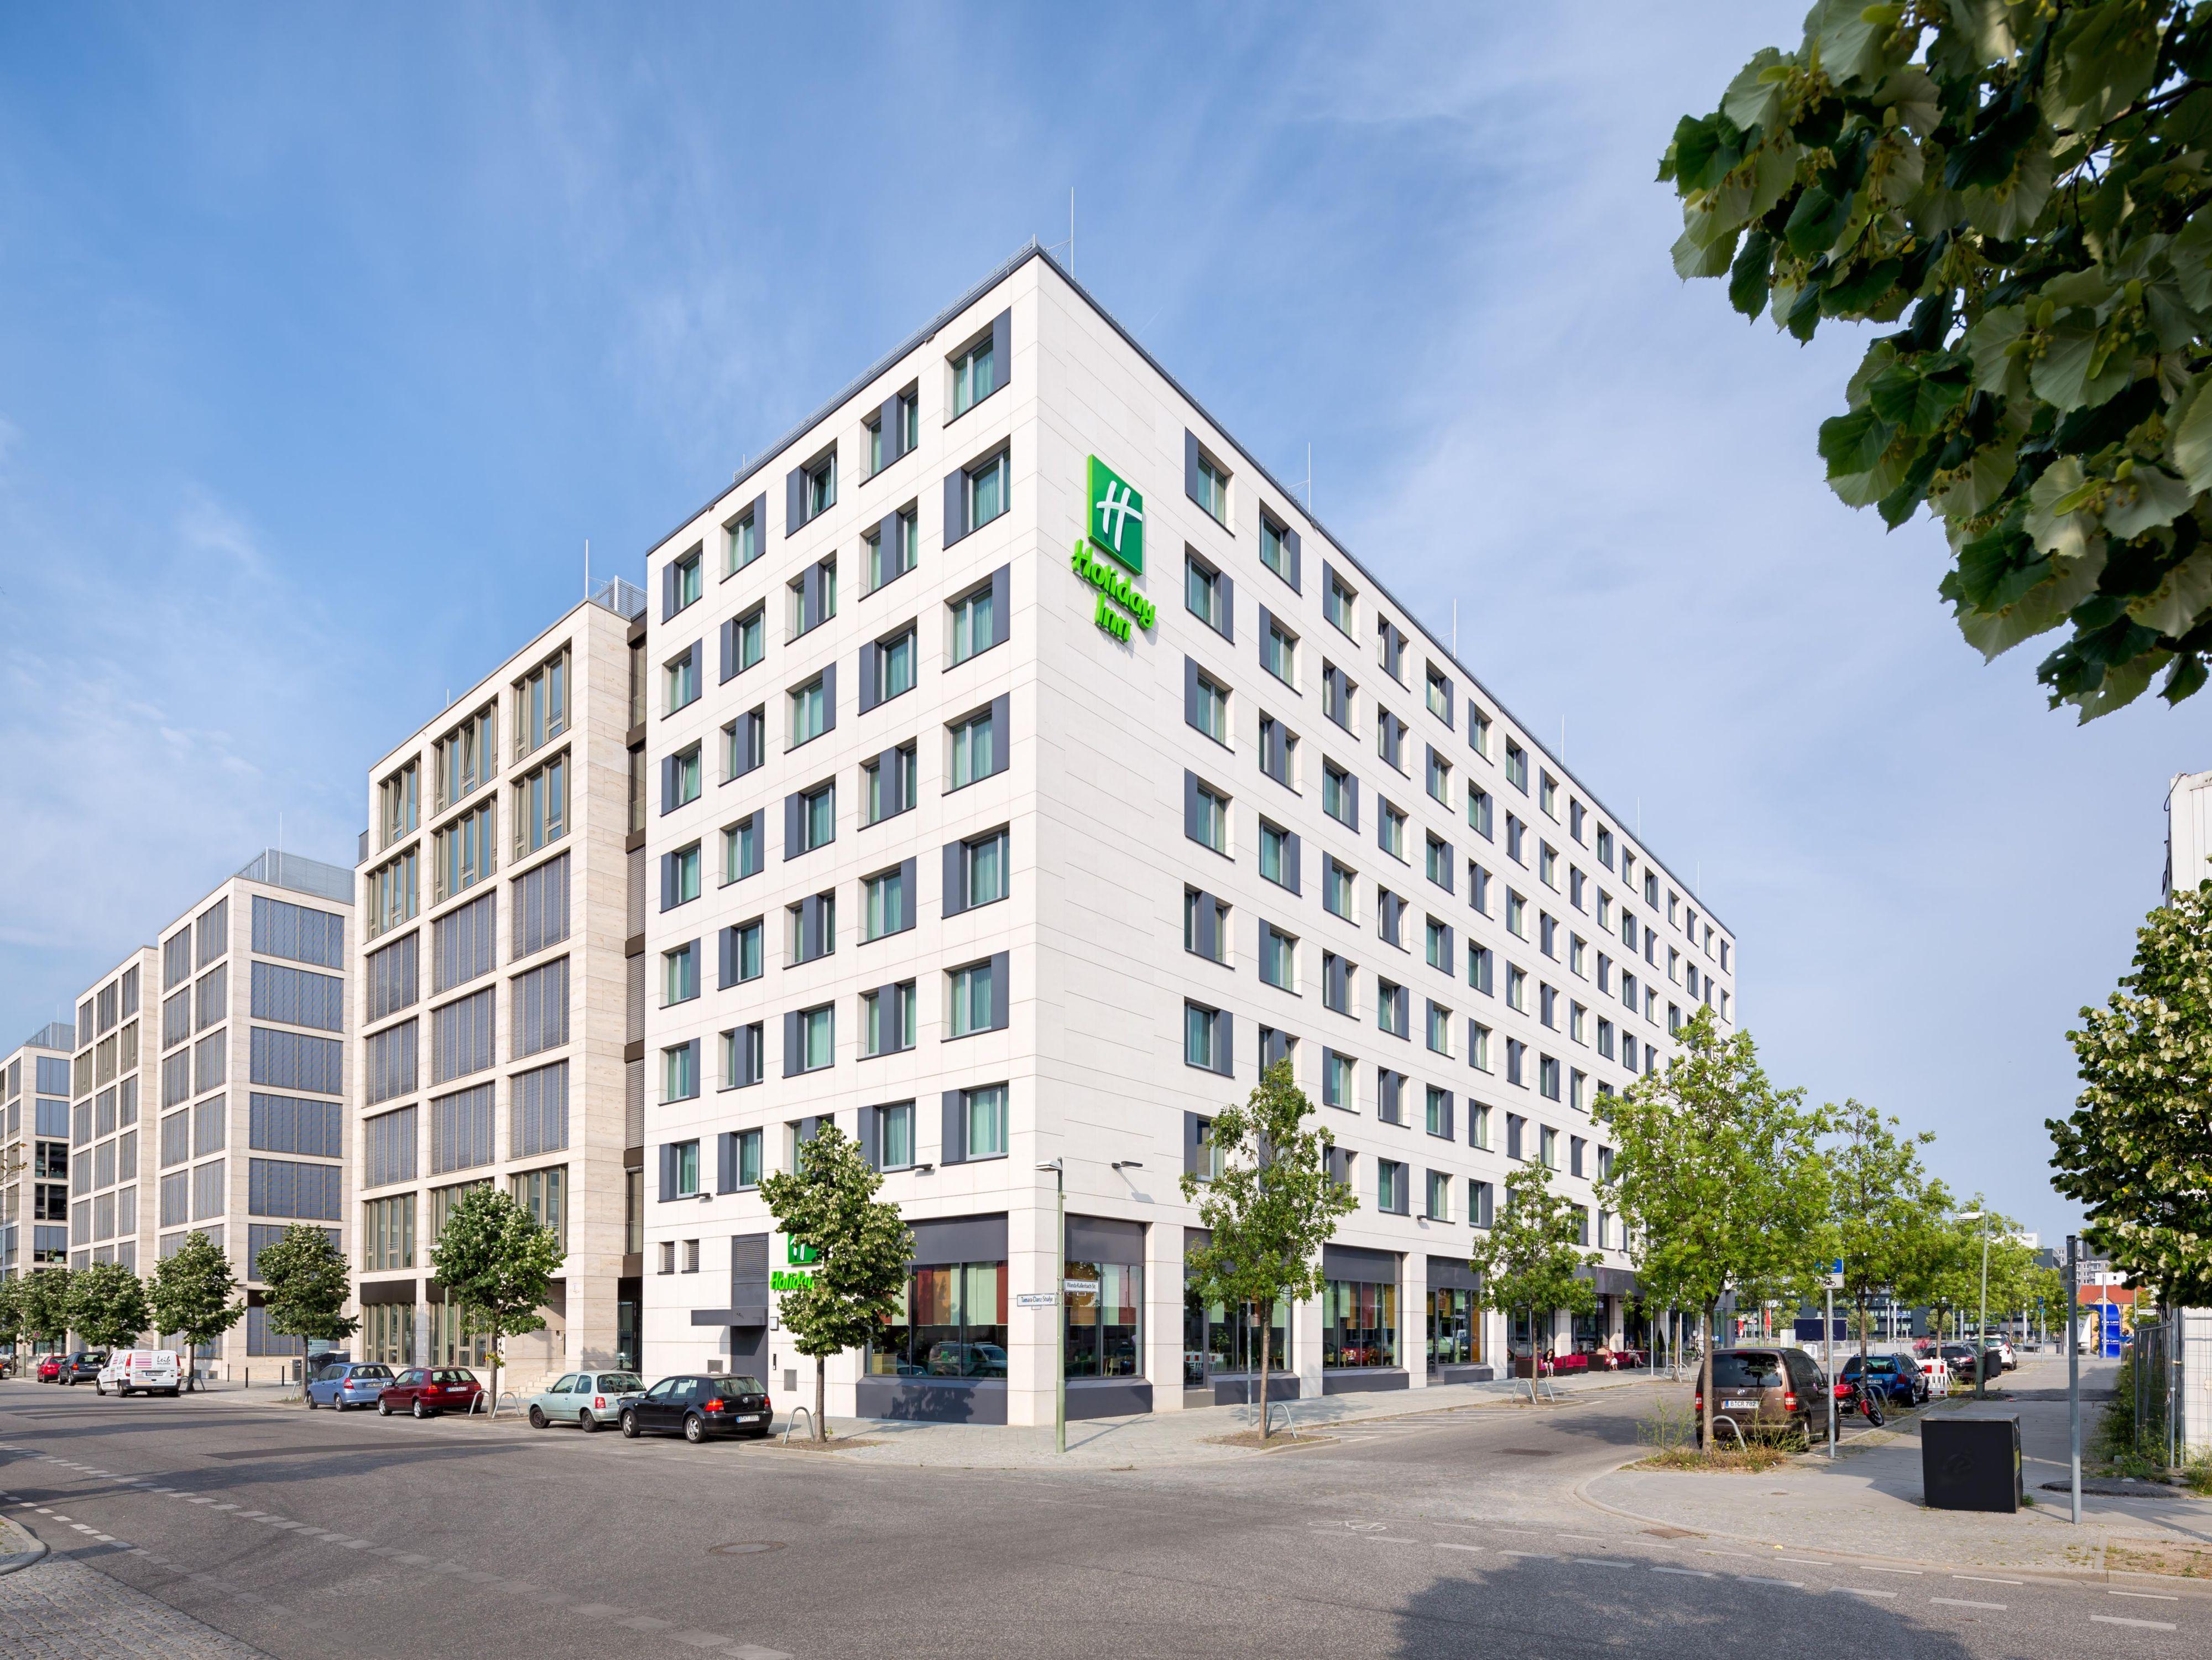 Berlin Hotels In Der Nahe Von East Side Gallery Holiday Inn Berlin